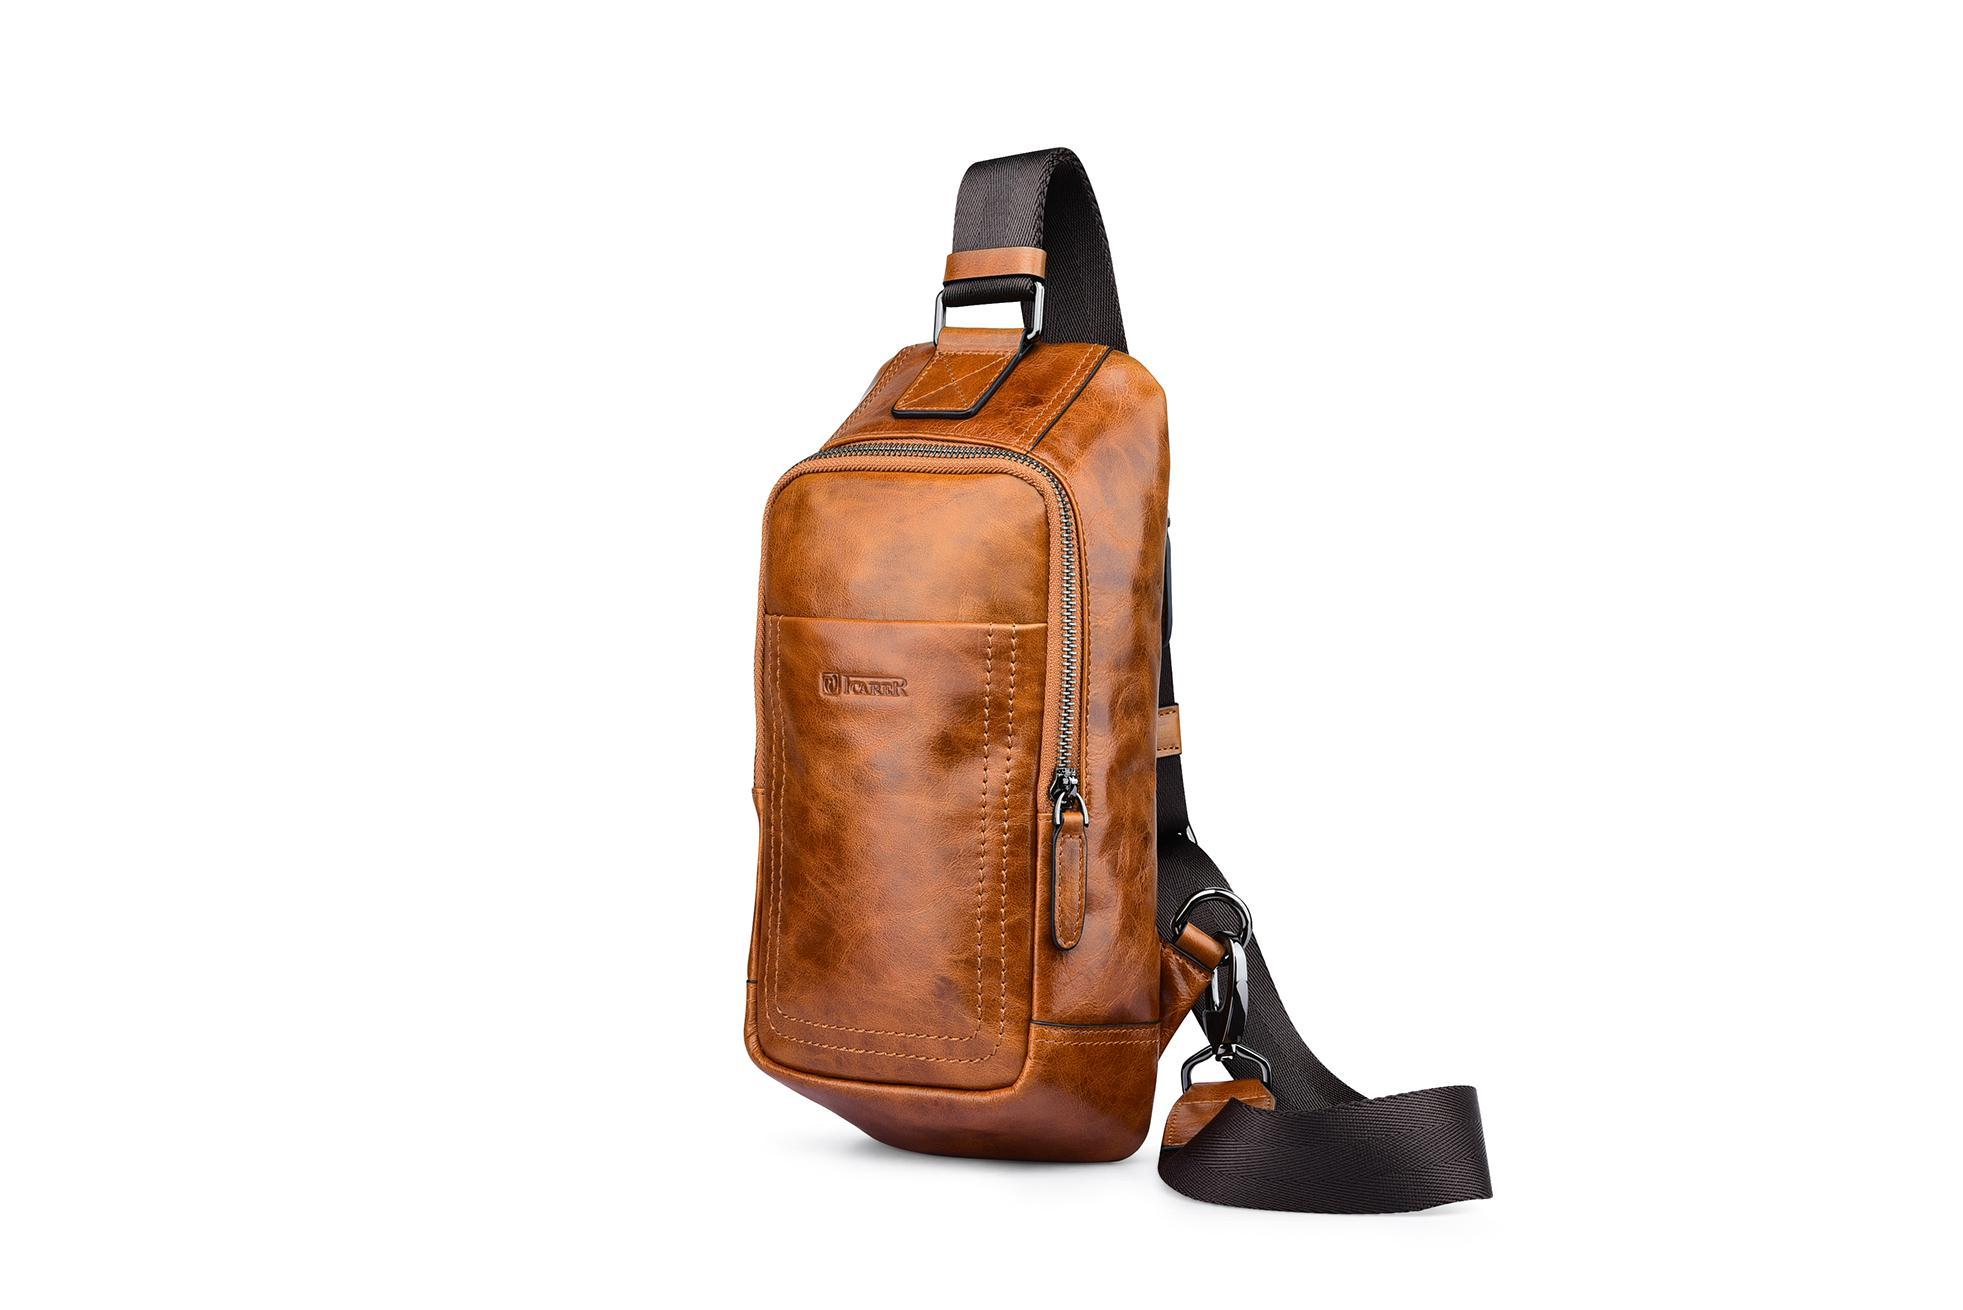 iCarer Vintage Oil Wax Real Leather Cross Body Bag 4